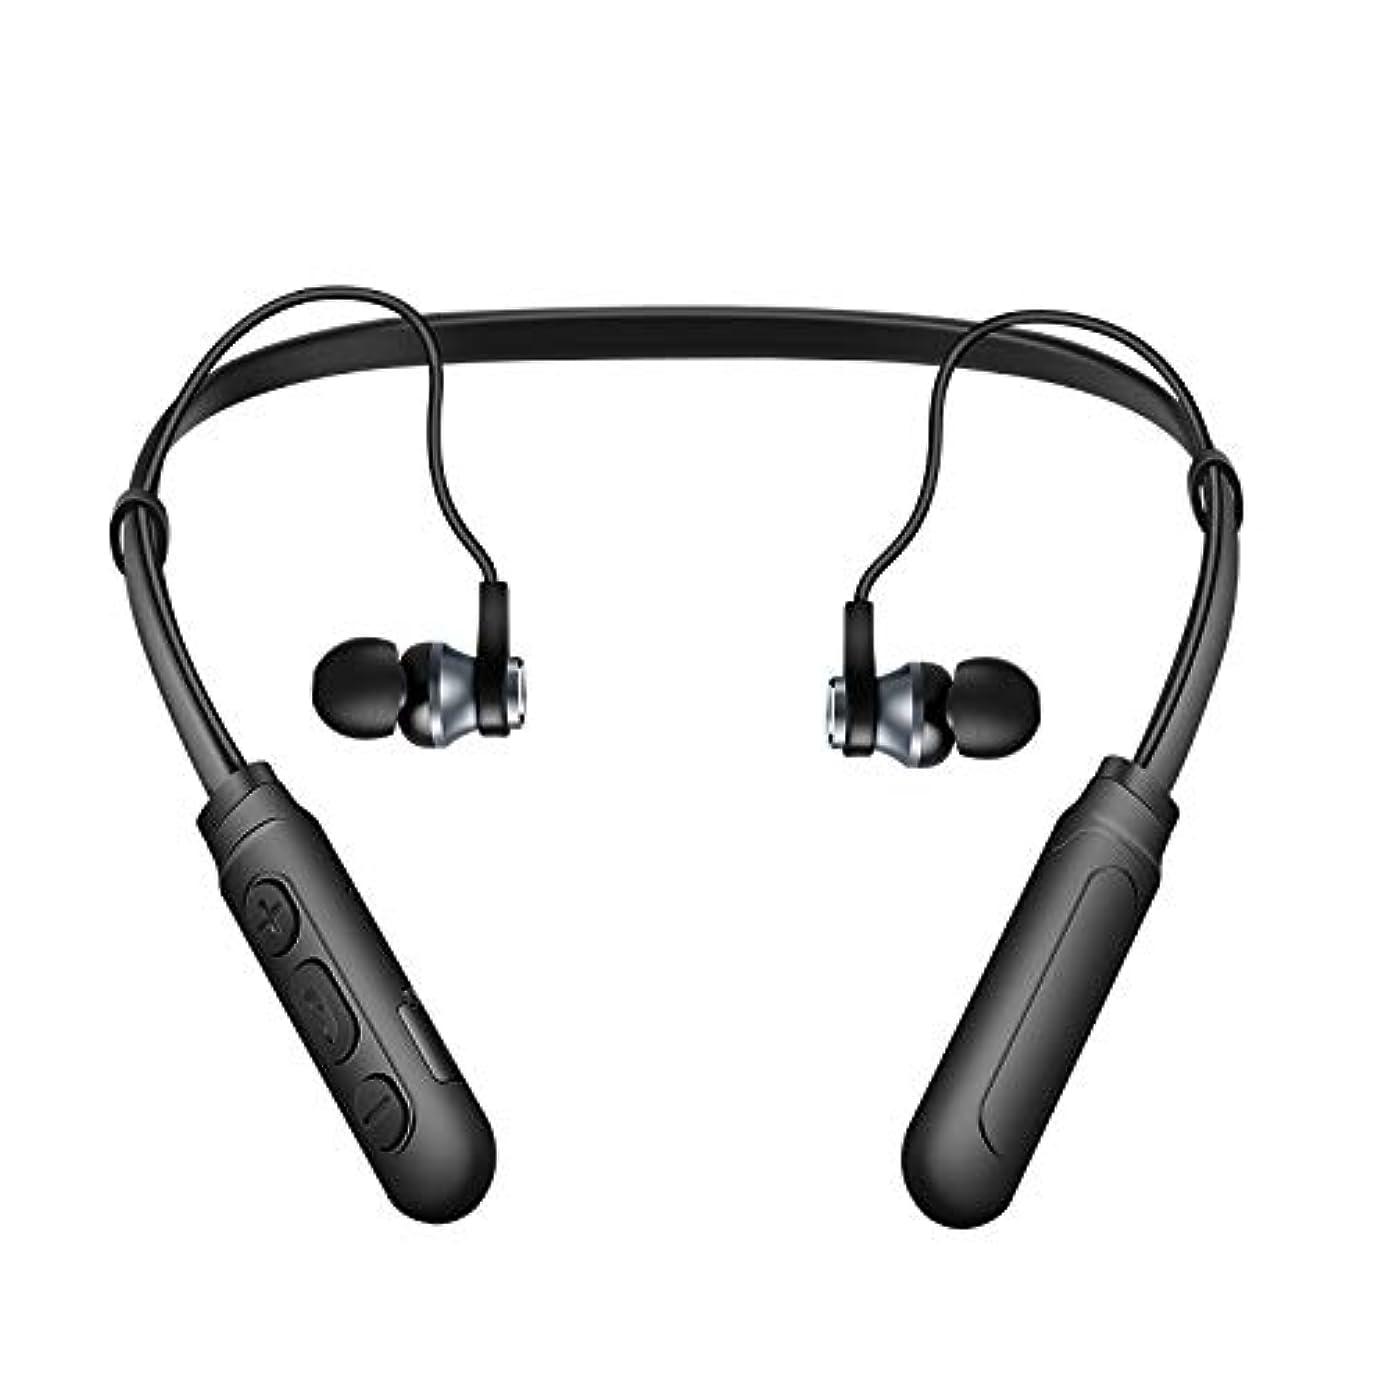 HOUSINGLOVES Wireless Bluetooth 5.0 Sweatproof Sport Gym Headset Stereo Headphone Earphone